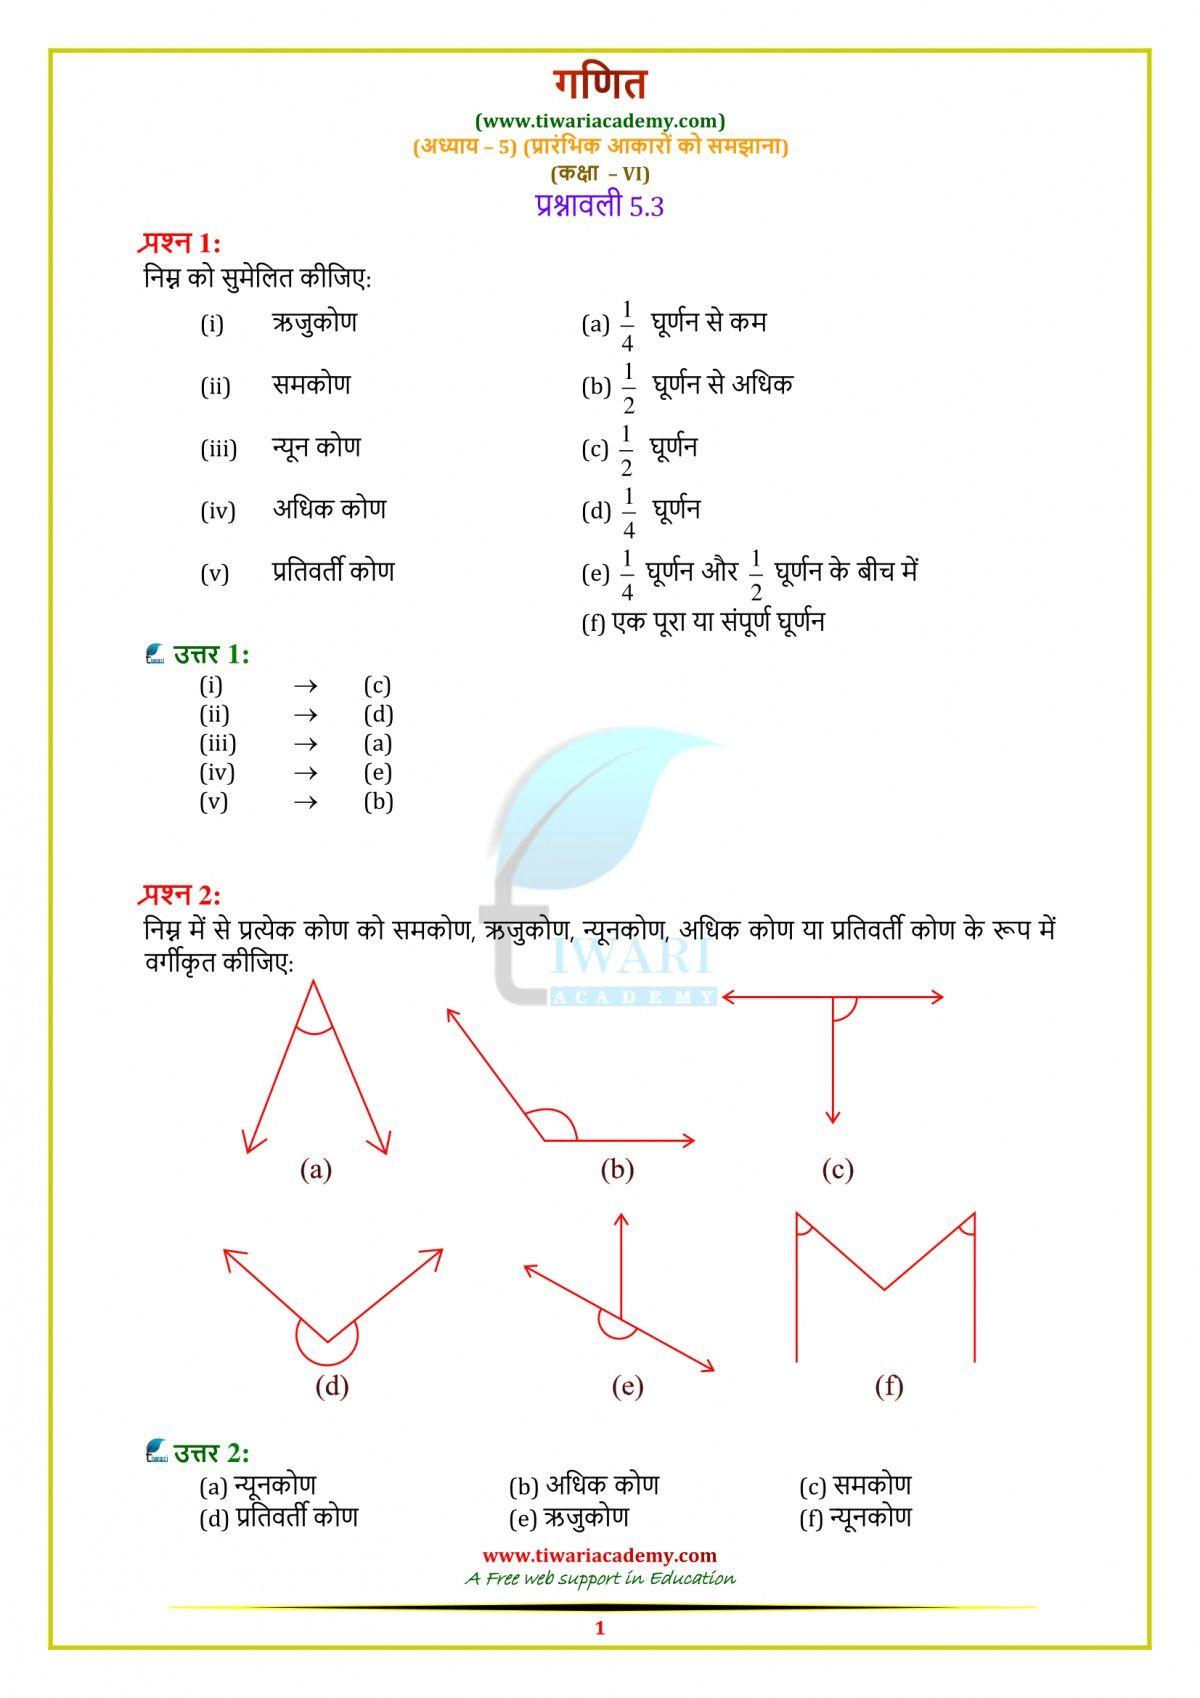 Https Www Tiwariacademy Com Ncert Solutions Class 6 Maths Chapter 5 Class 6 Maths Math Solutions [ 1698 x 1200 Pixel ]